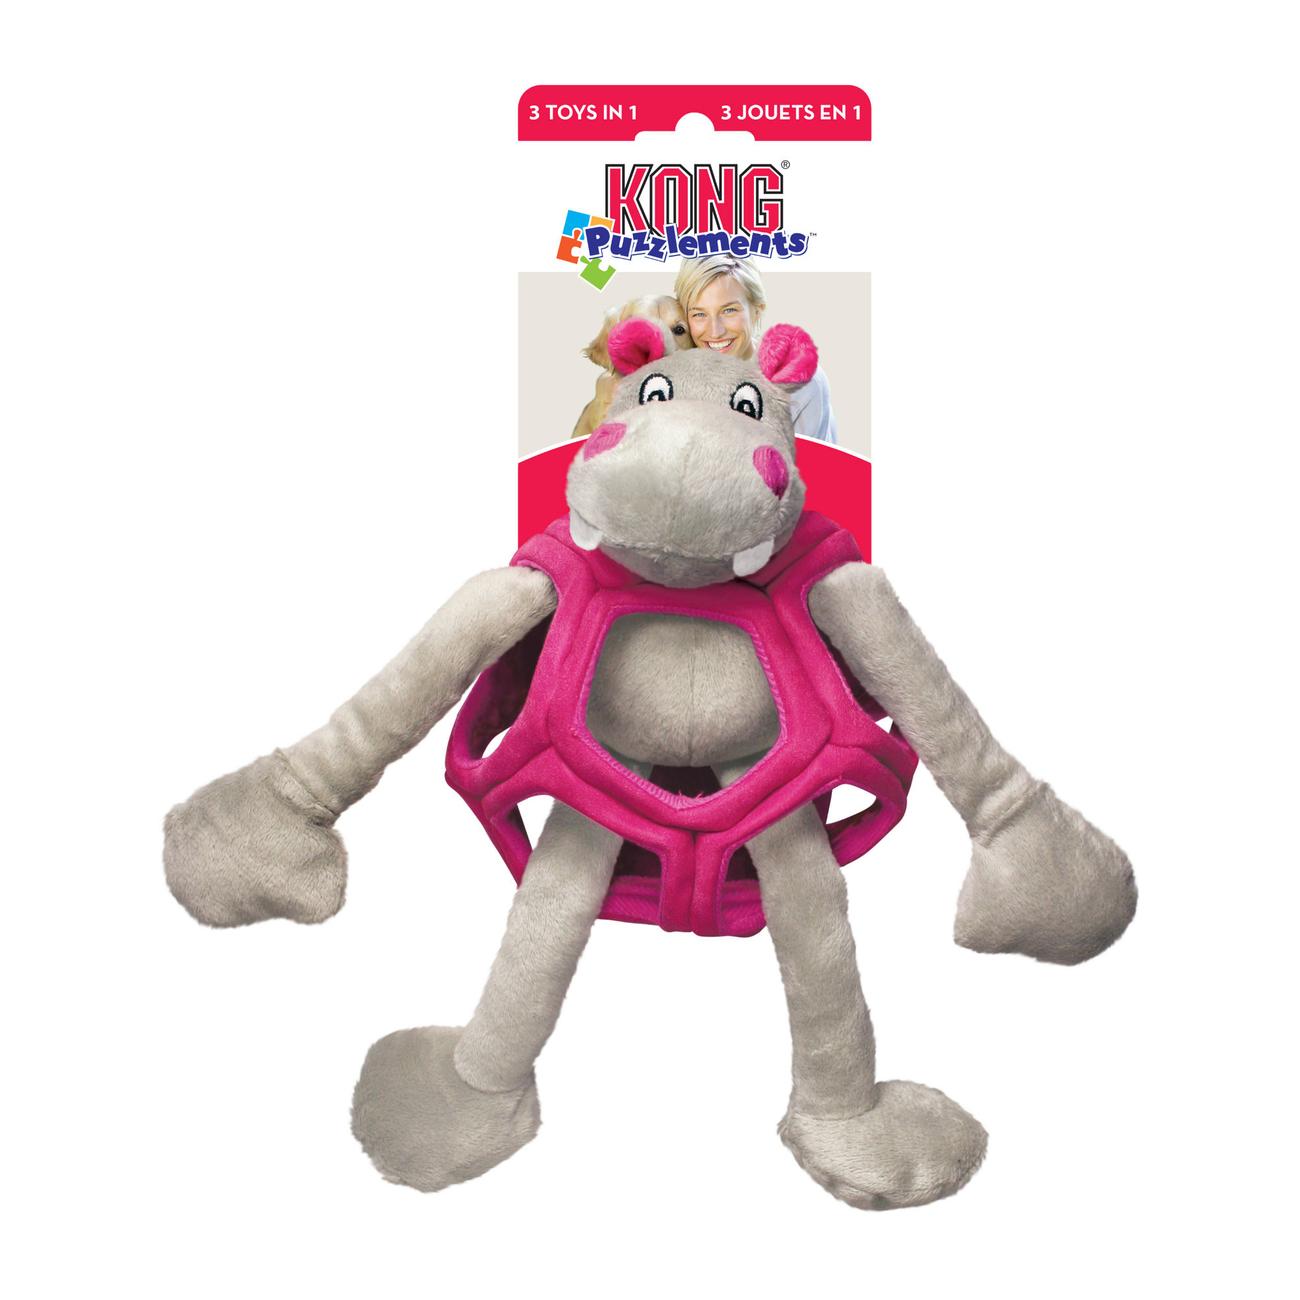 KONG Puzzlements Hundespielzeug, Bild 7